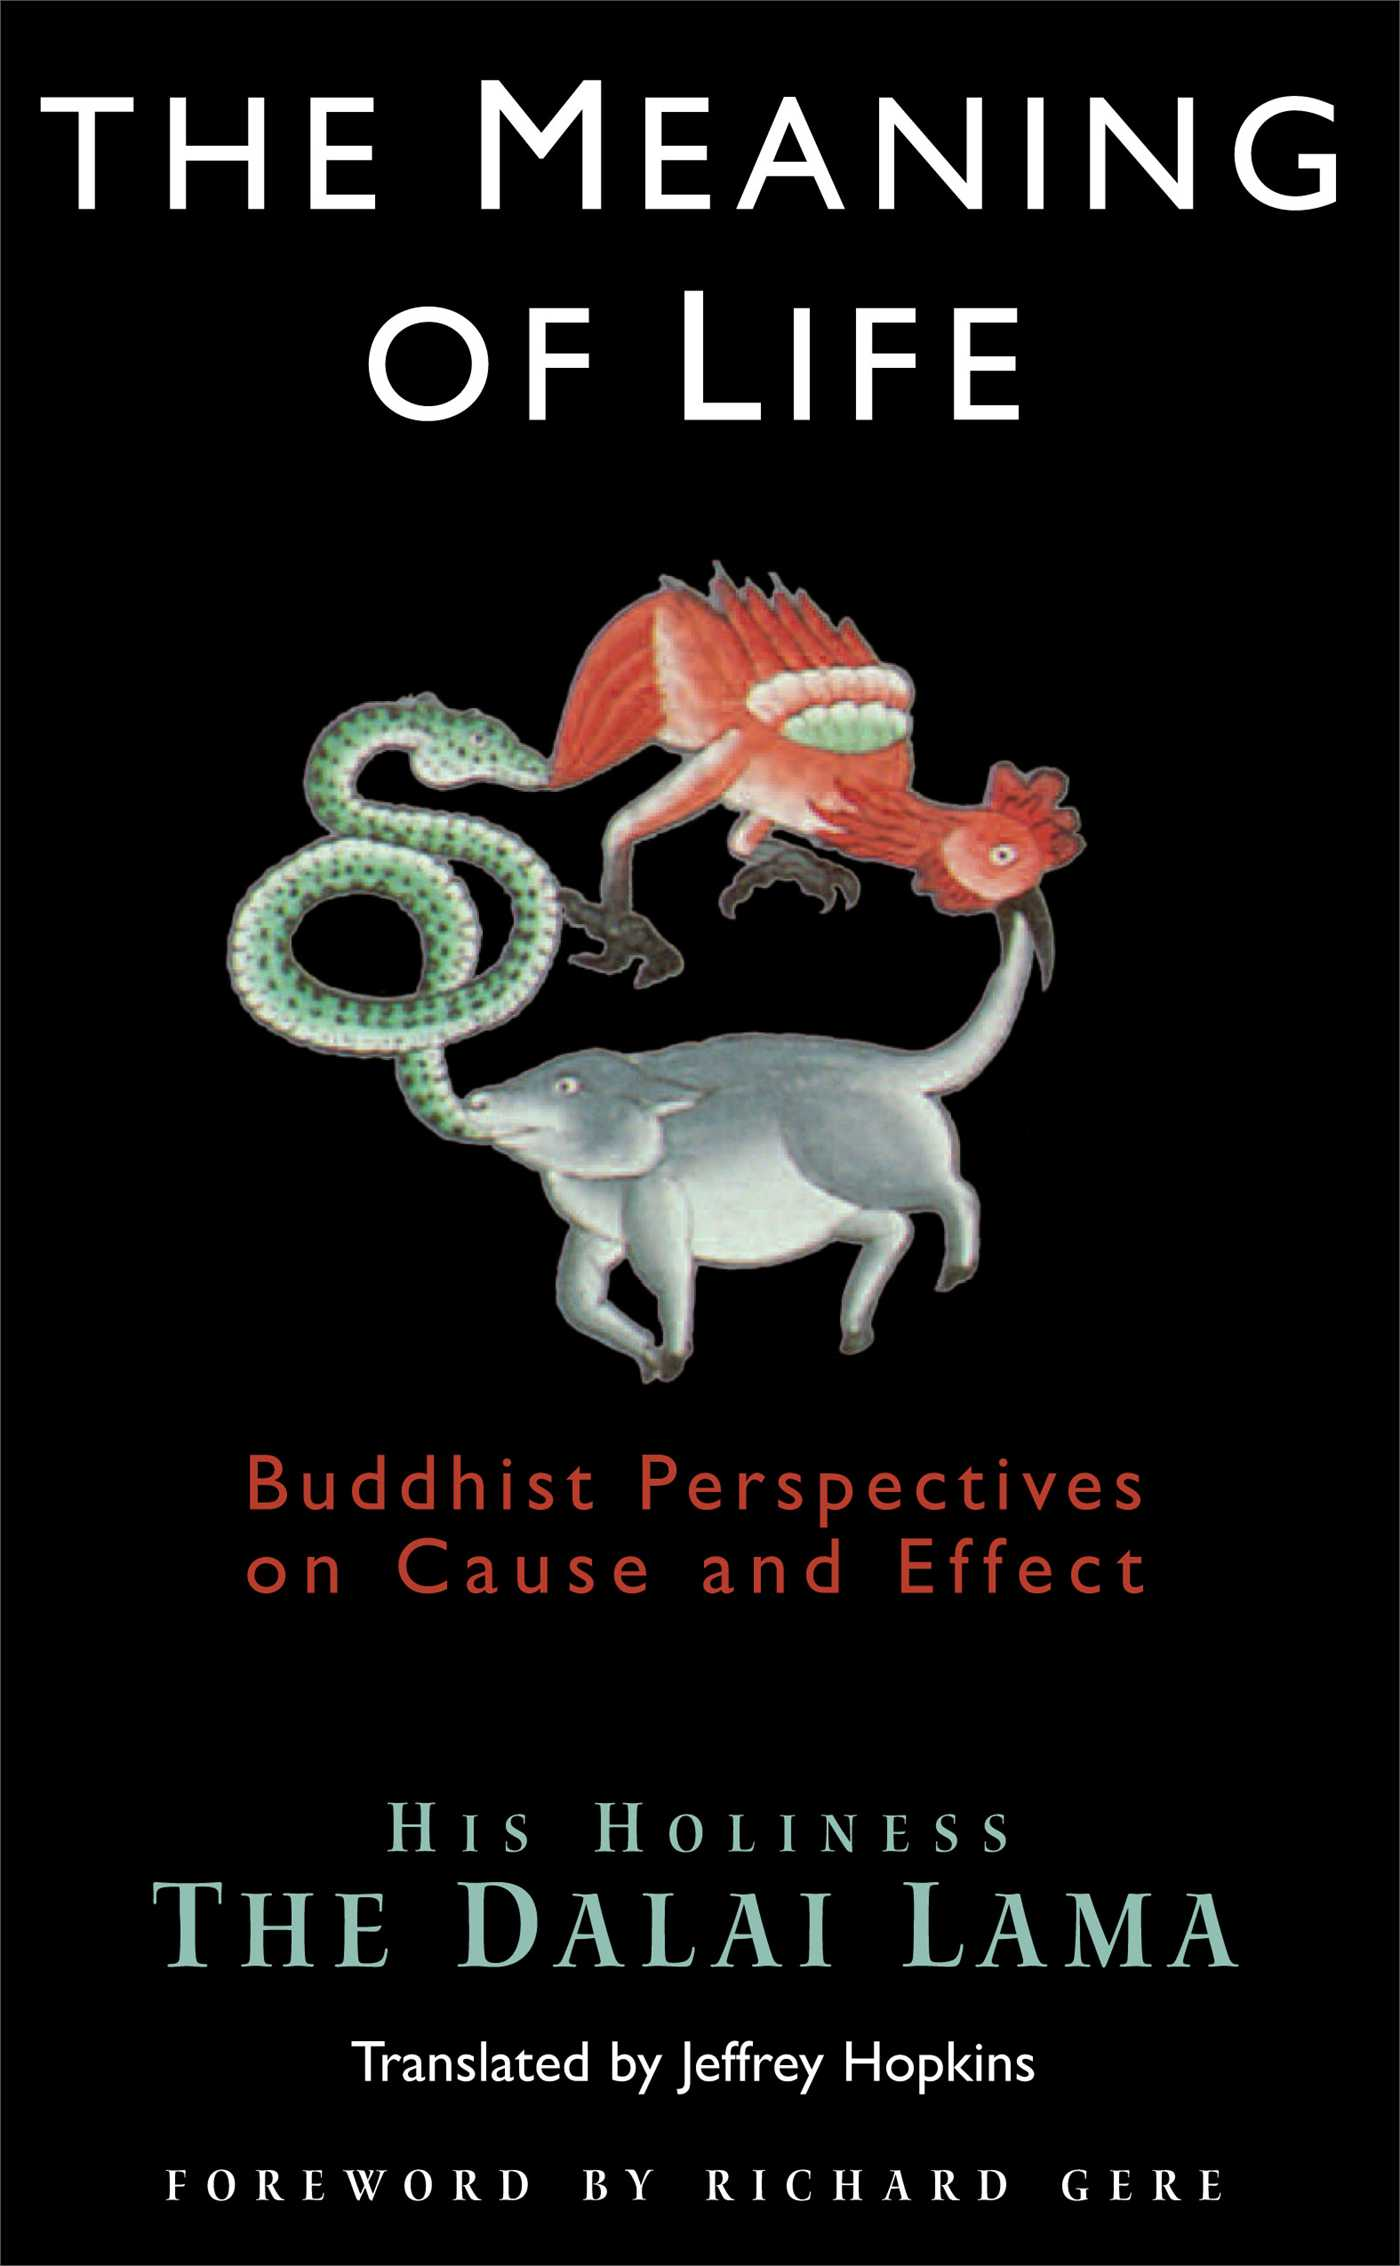 The Meaning of Life eBook by Dalai Lama, Jeffrey Hopkins